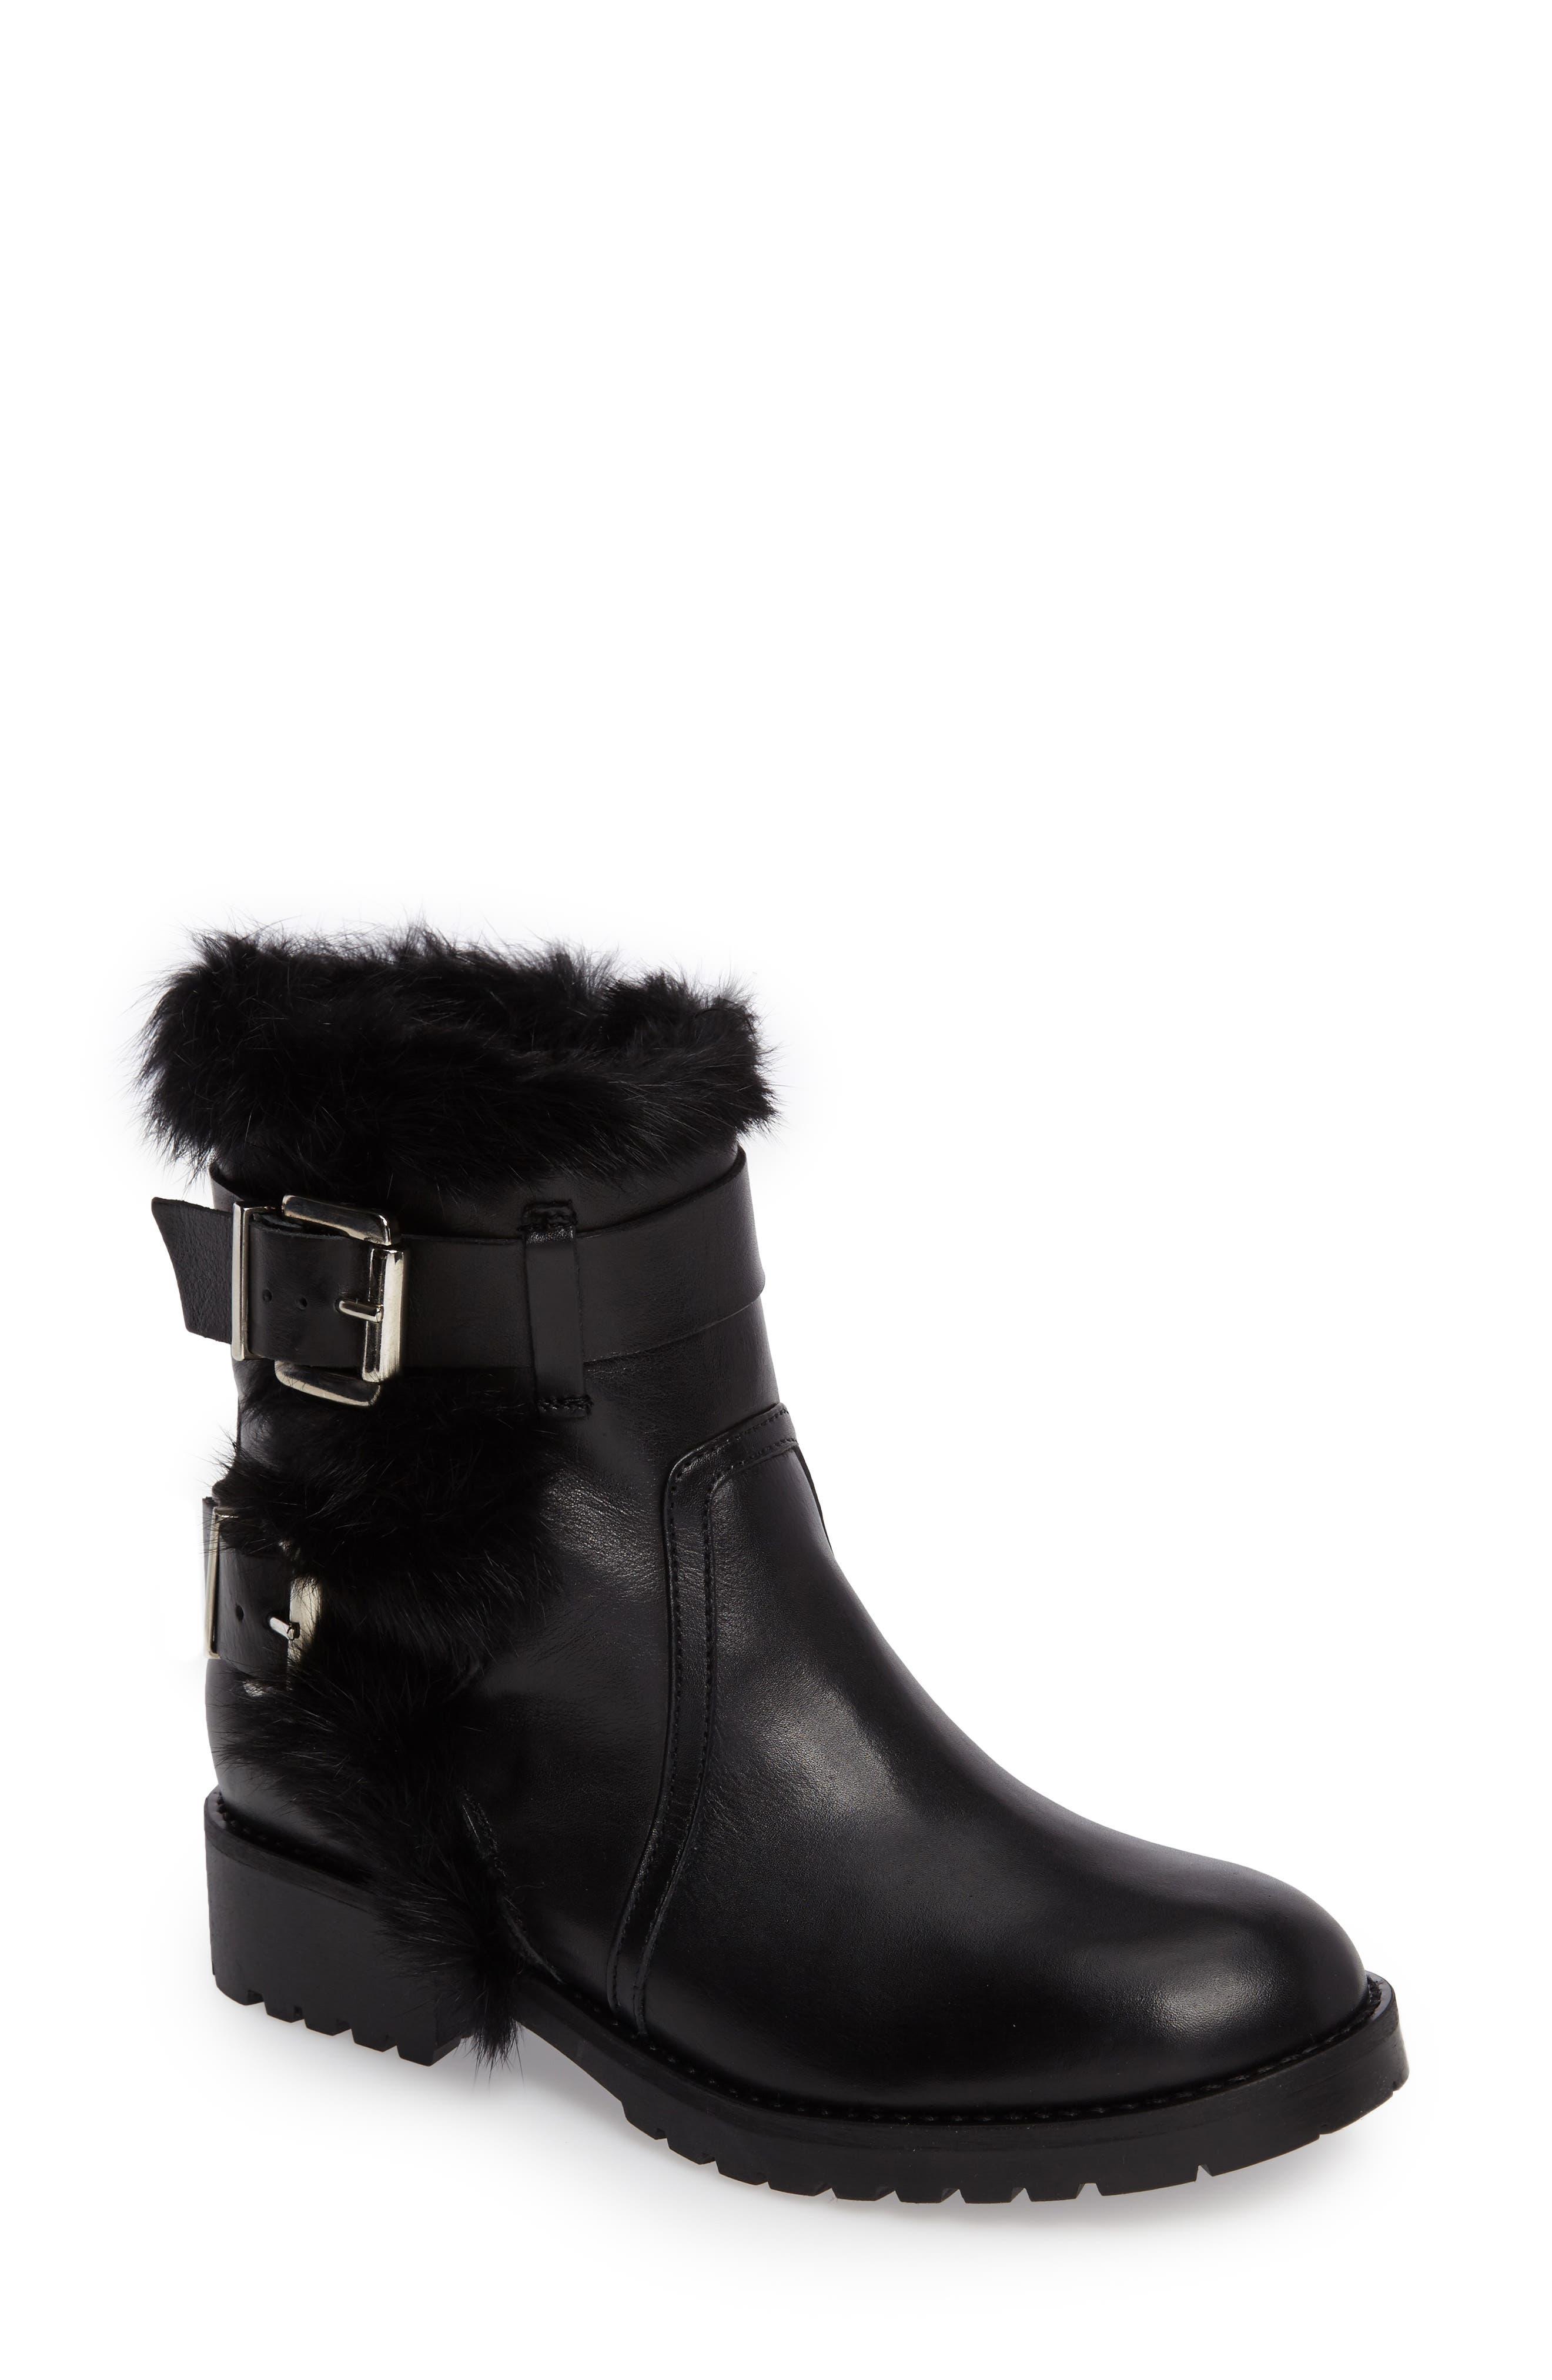 Rustic Genuine Rabbit Fur Cuff Boot,                         Main,                         color, 001